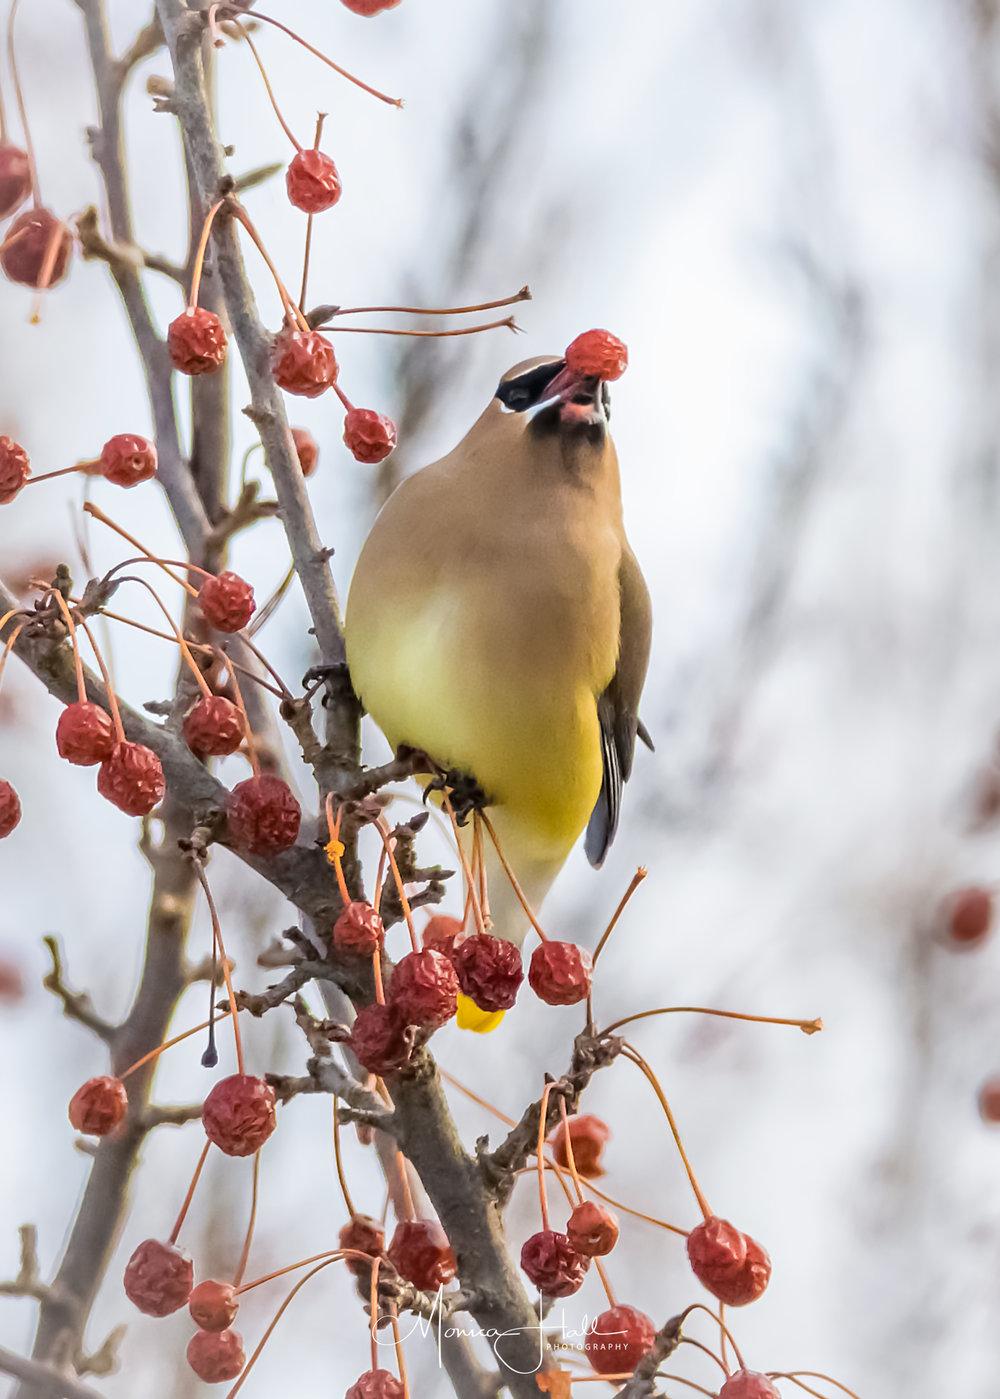 Cedar waxwing feasts on berries in winter. Photo by Monica Hall